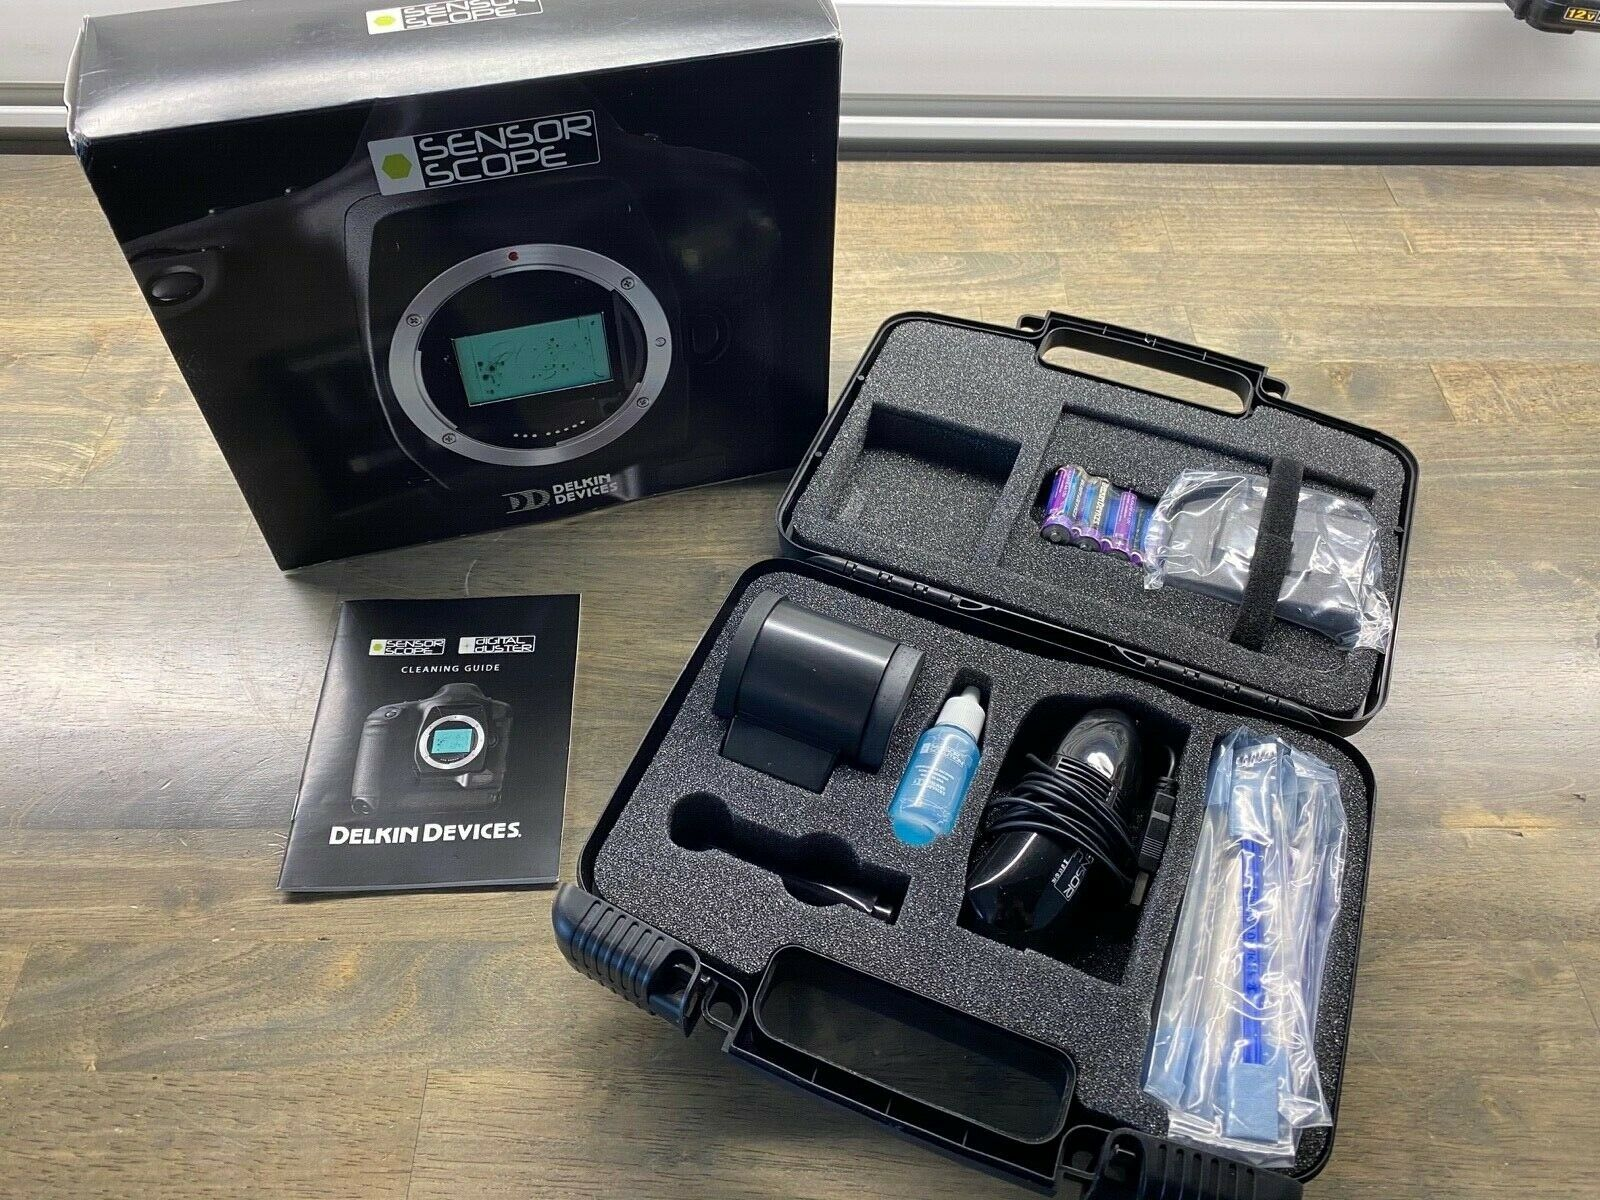 Sensor Scope Digital SLR Image Sensor Cleaning Kit Delkin